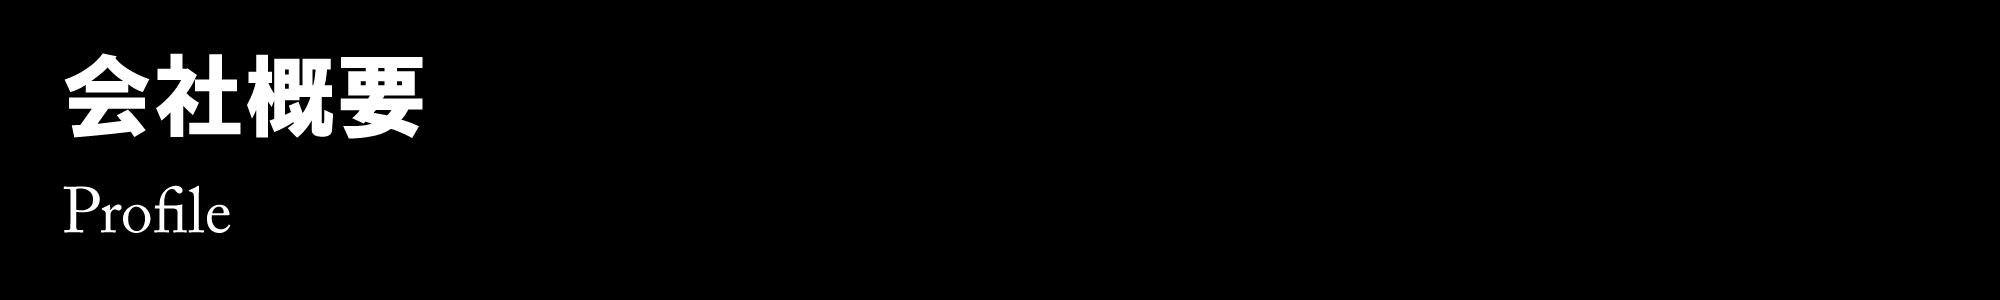 会社概要 - Profile